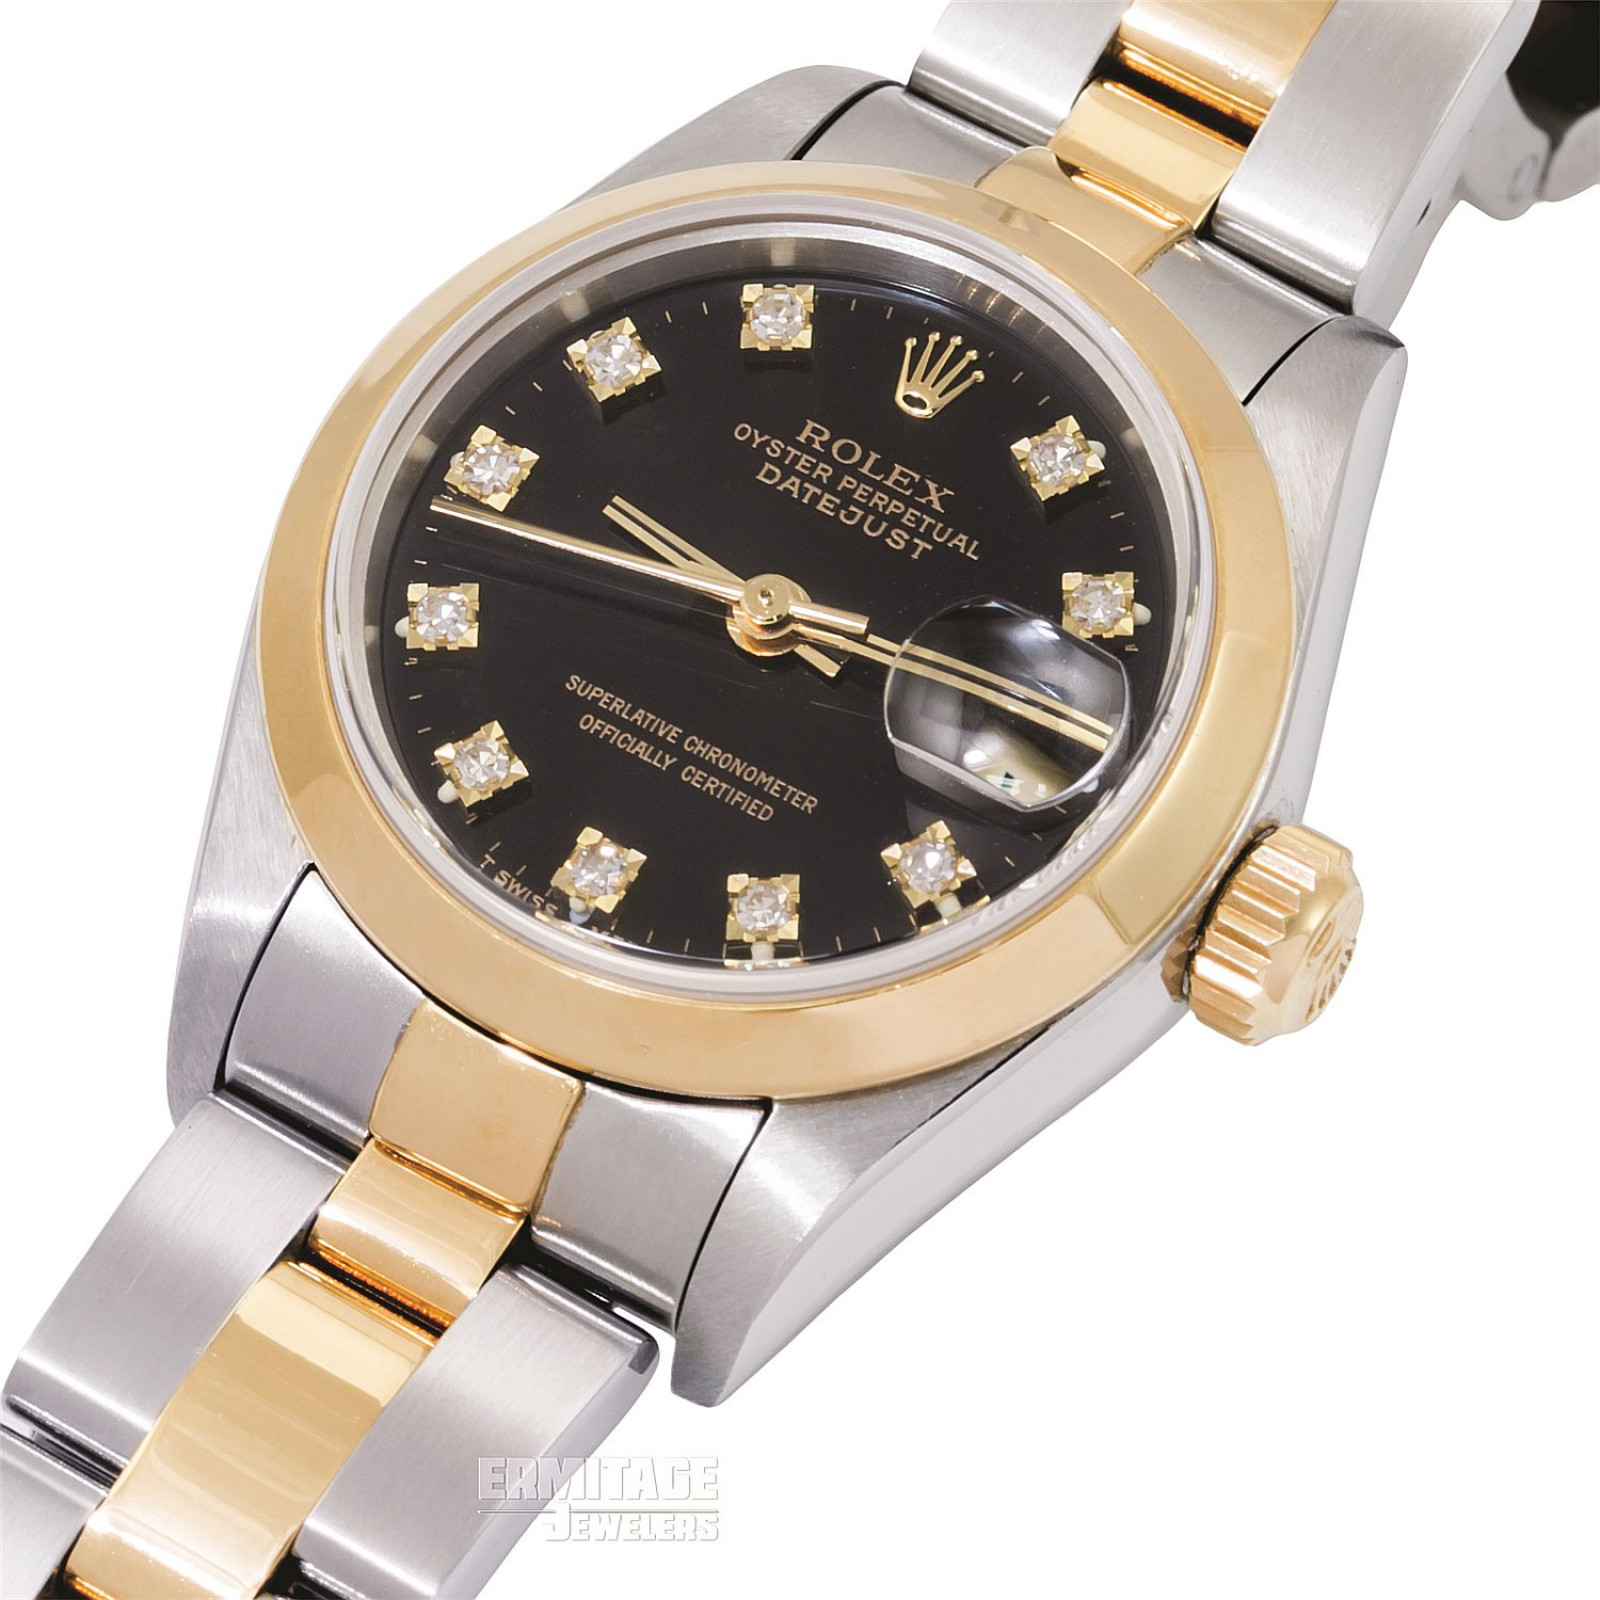 Dimaond Rolex Datejust Ref. 69163